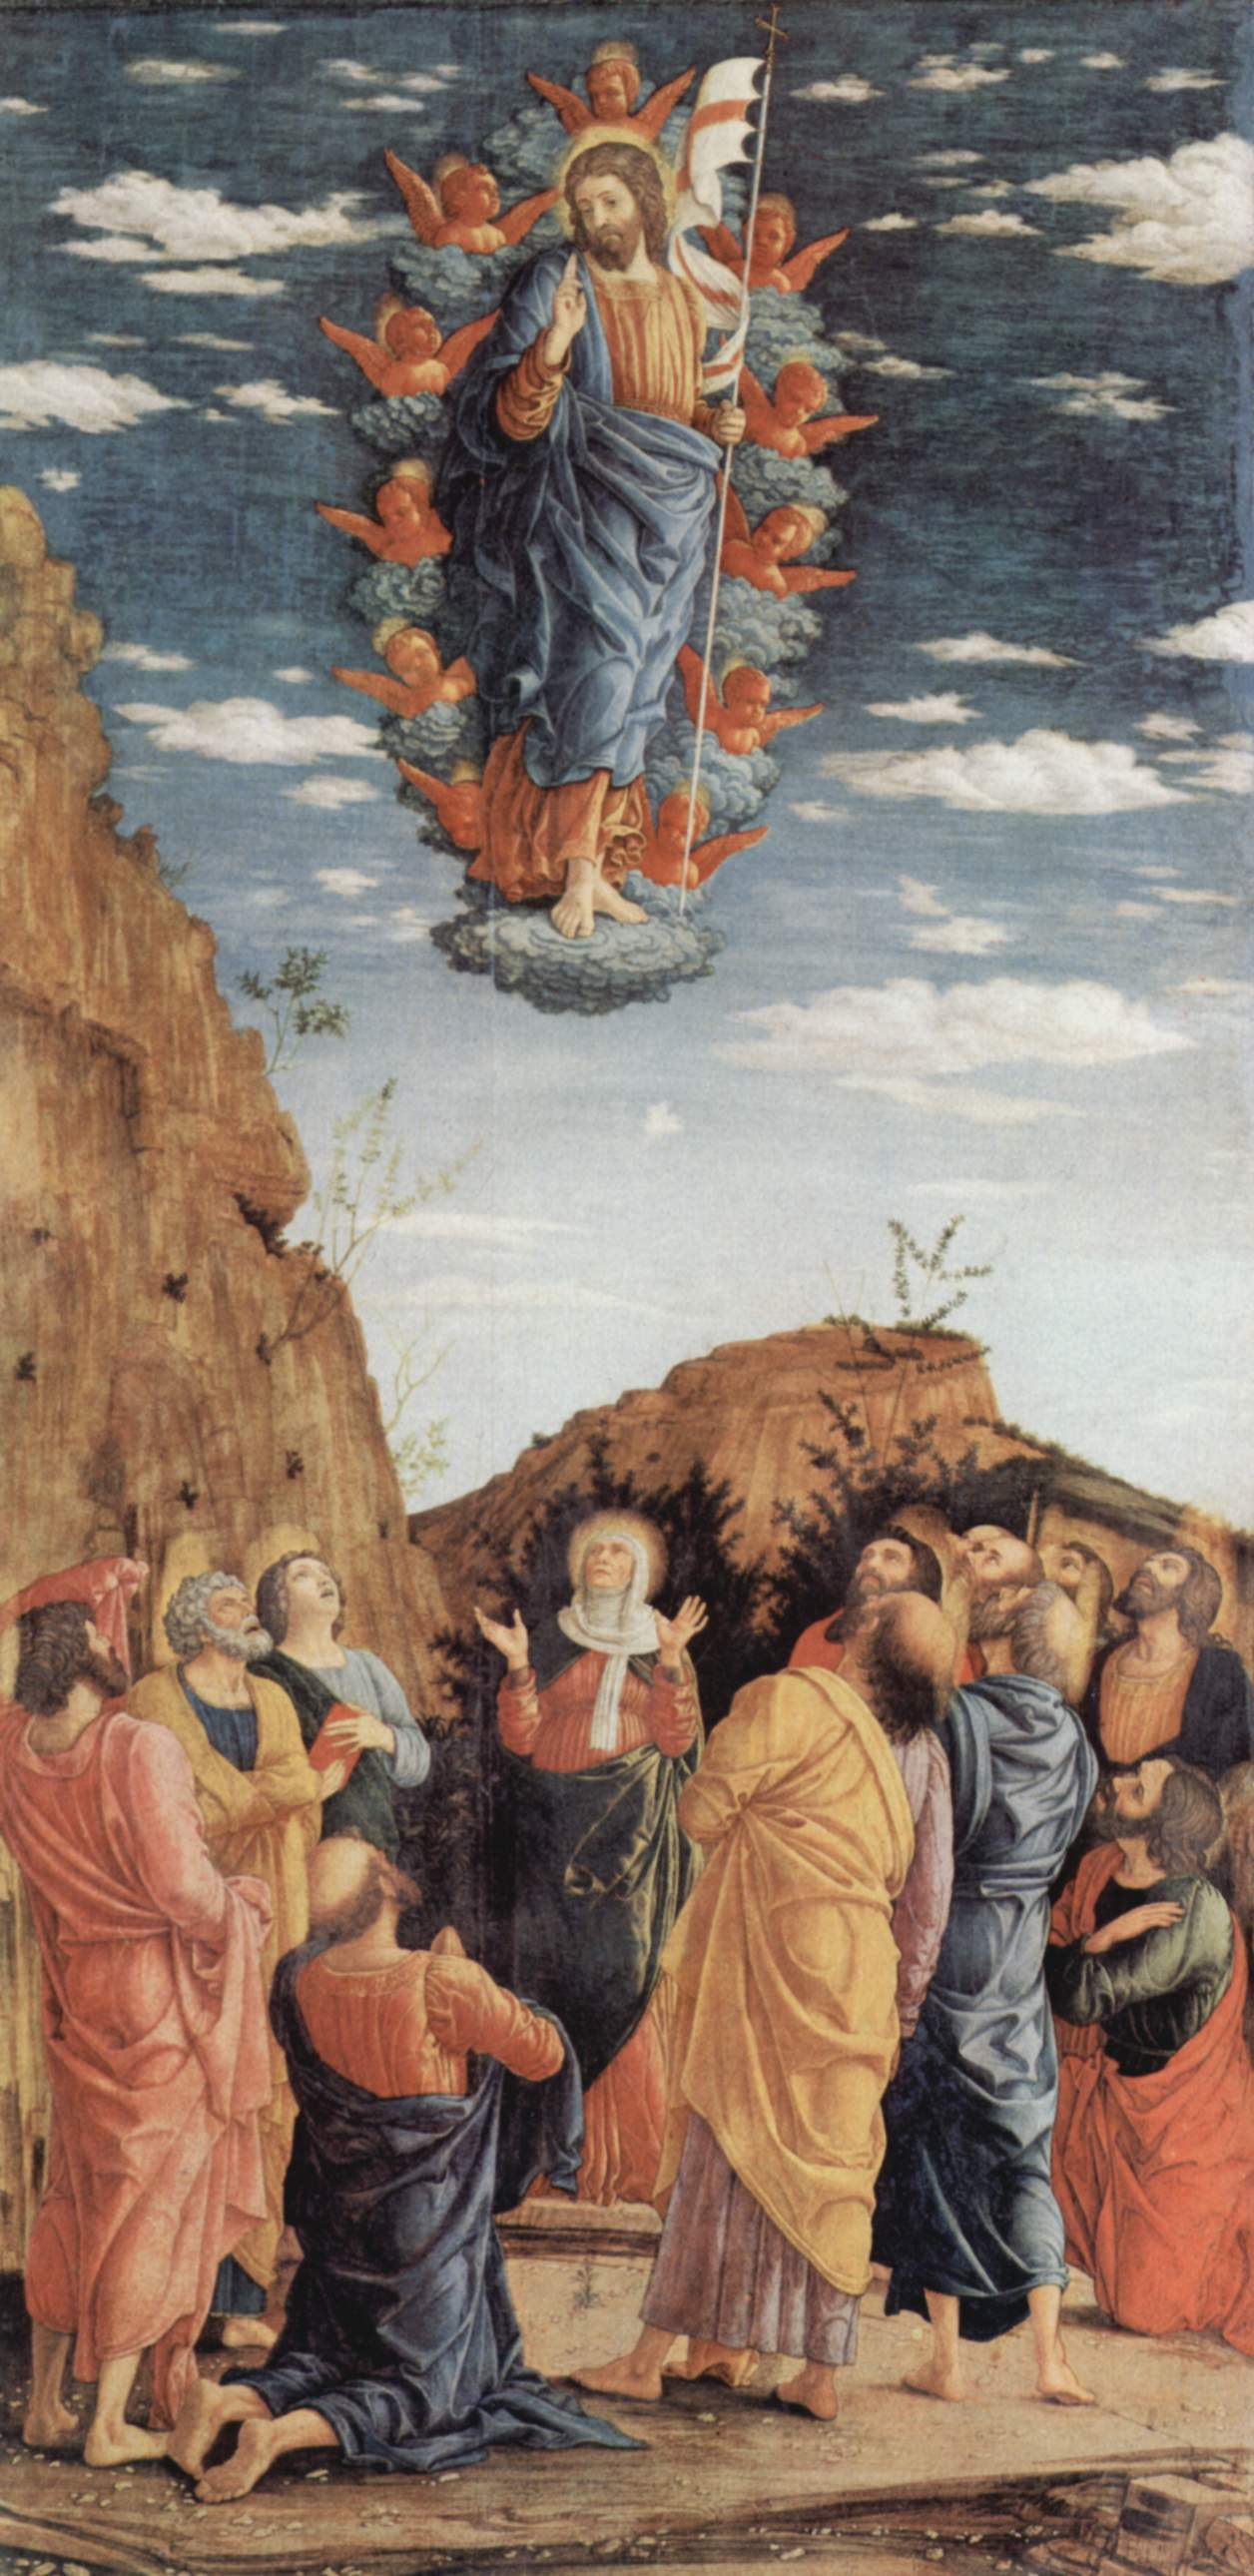 http://upload.wikimedia.org/wikipedia/commons/6/66/Andrea_Mantegna_012.jpg